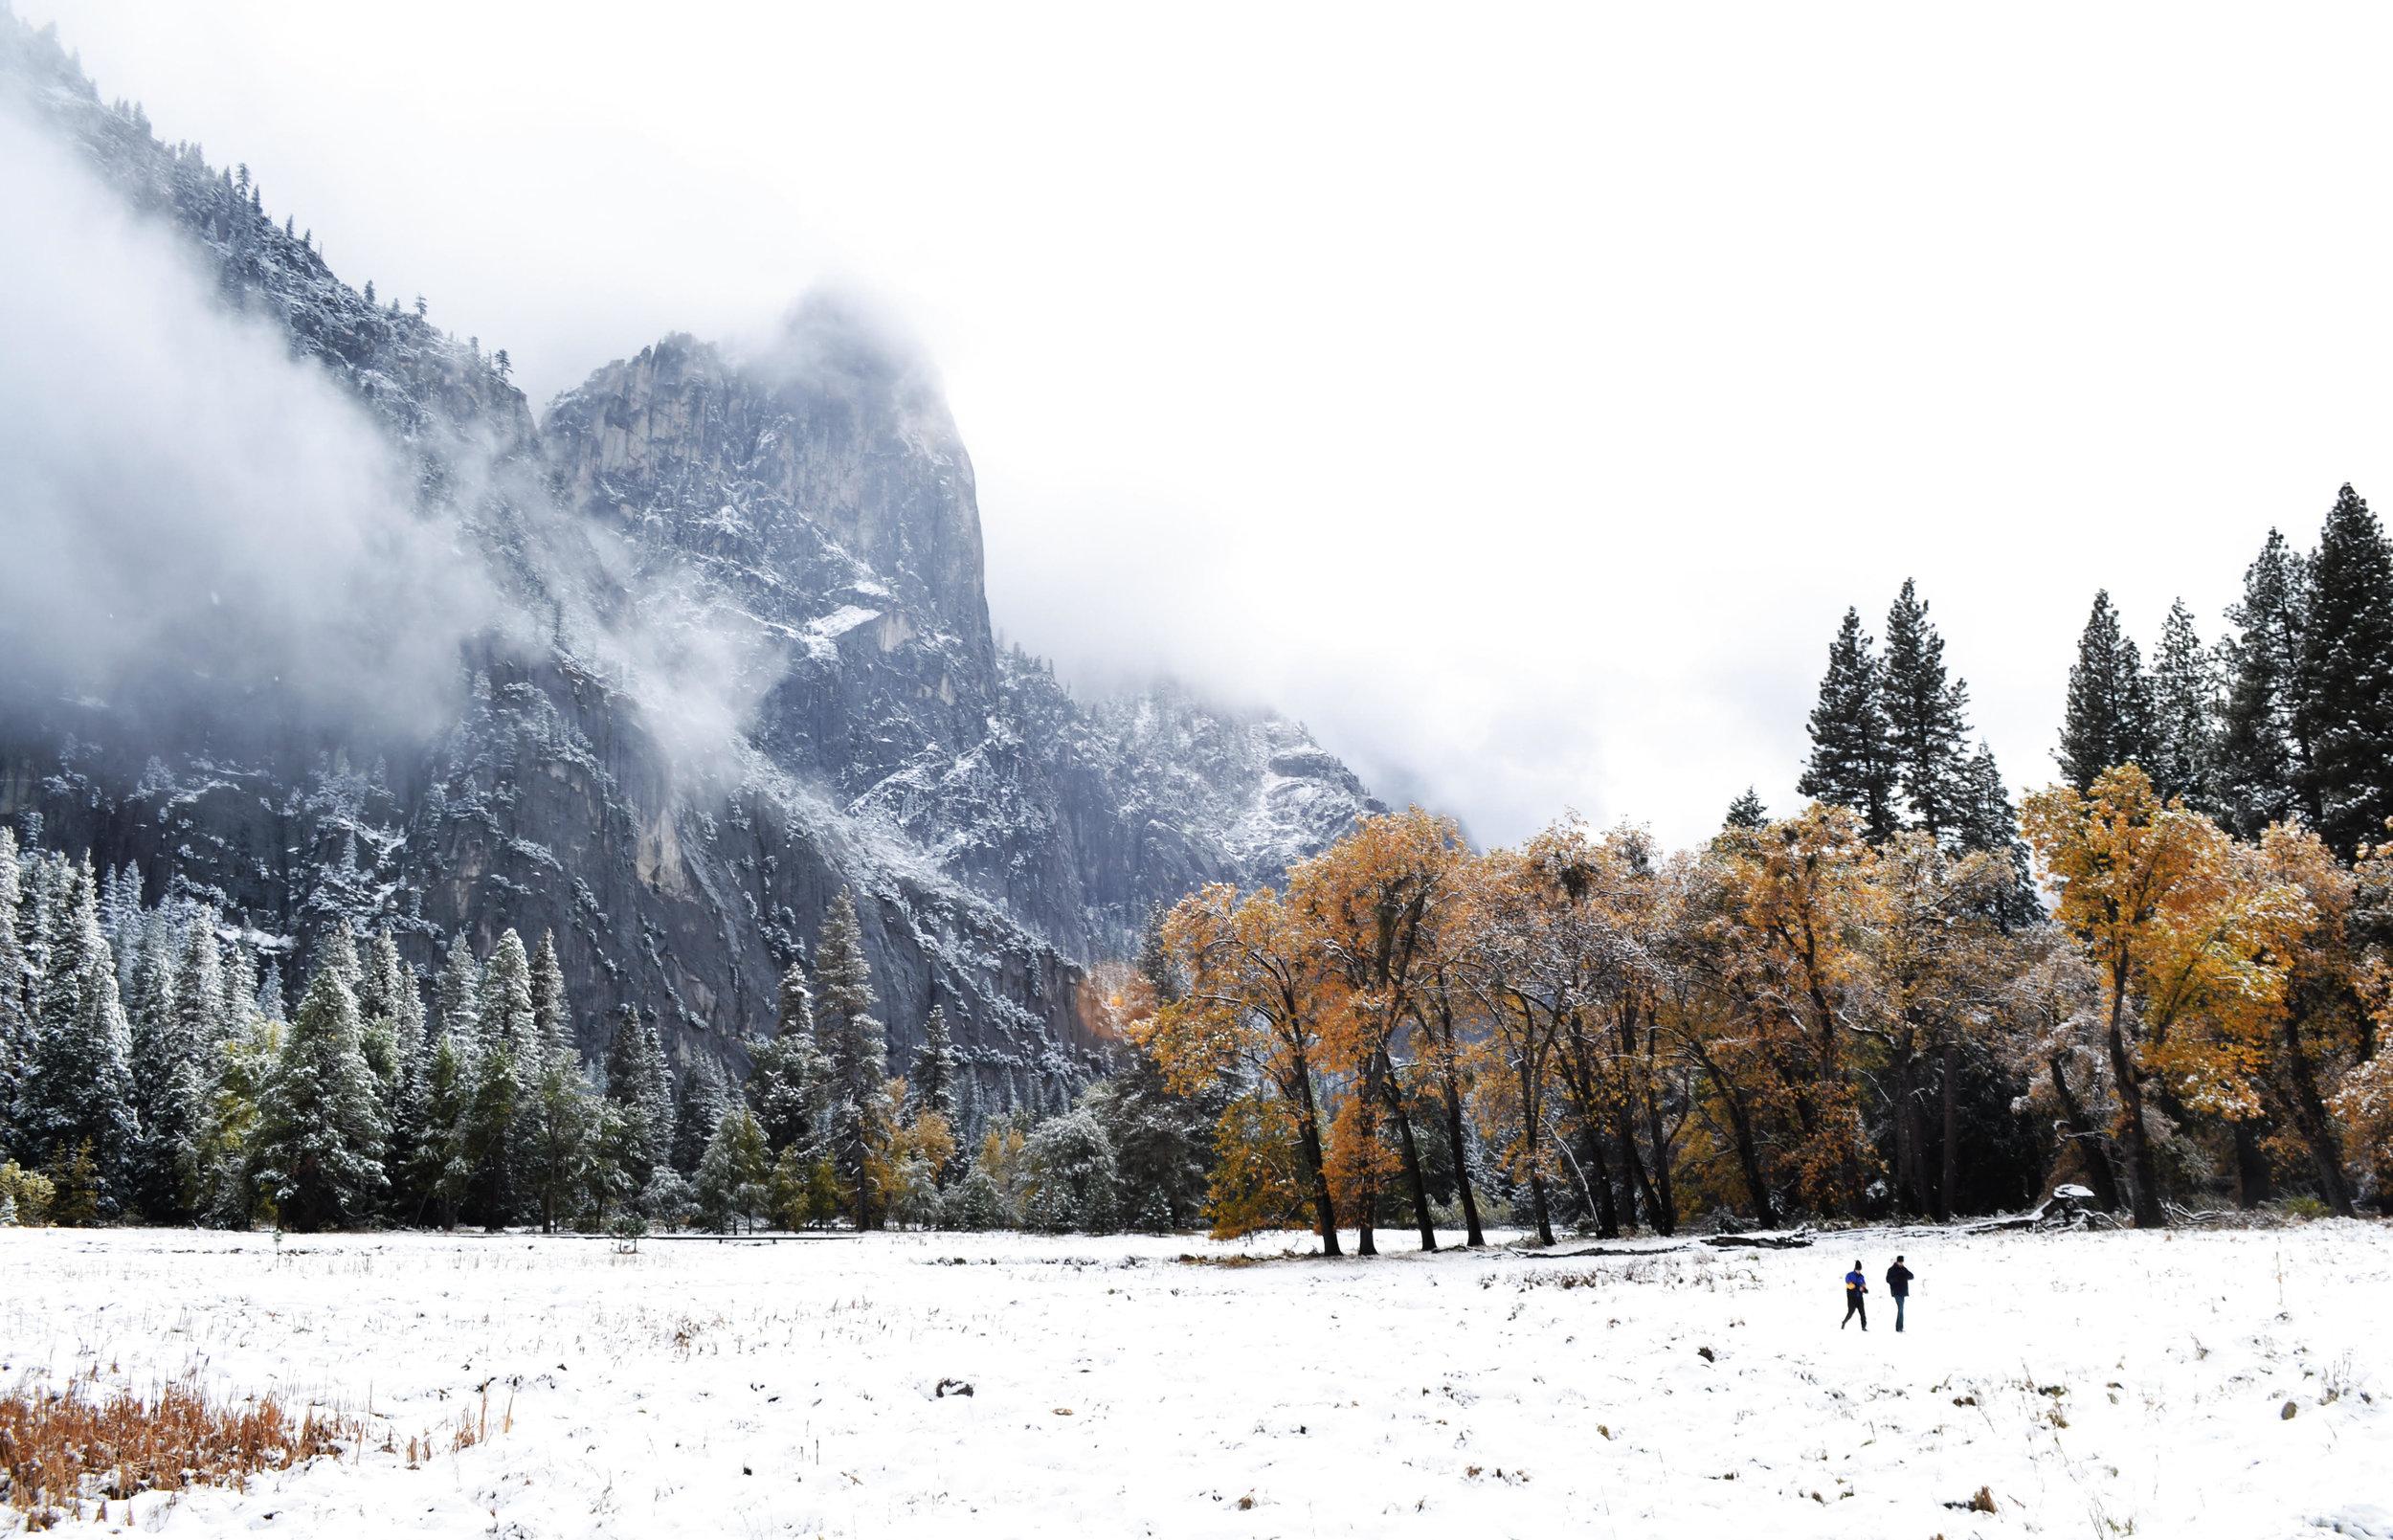 Yosemite Valley in November Photo: David Mason